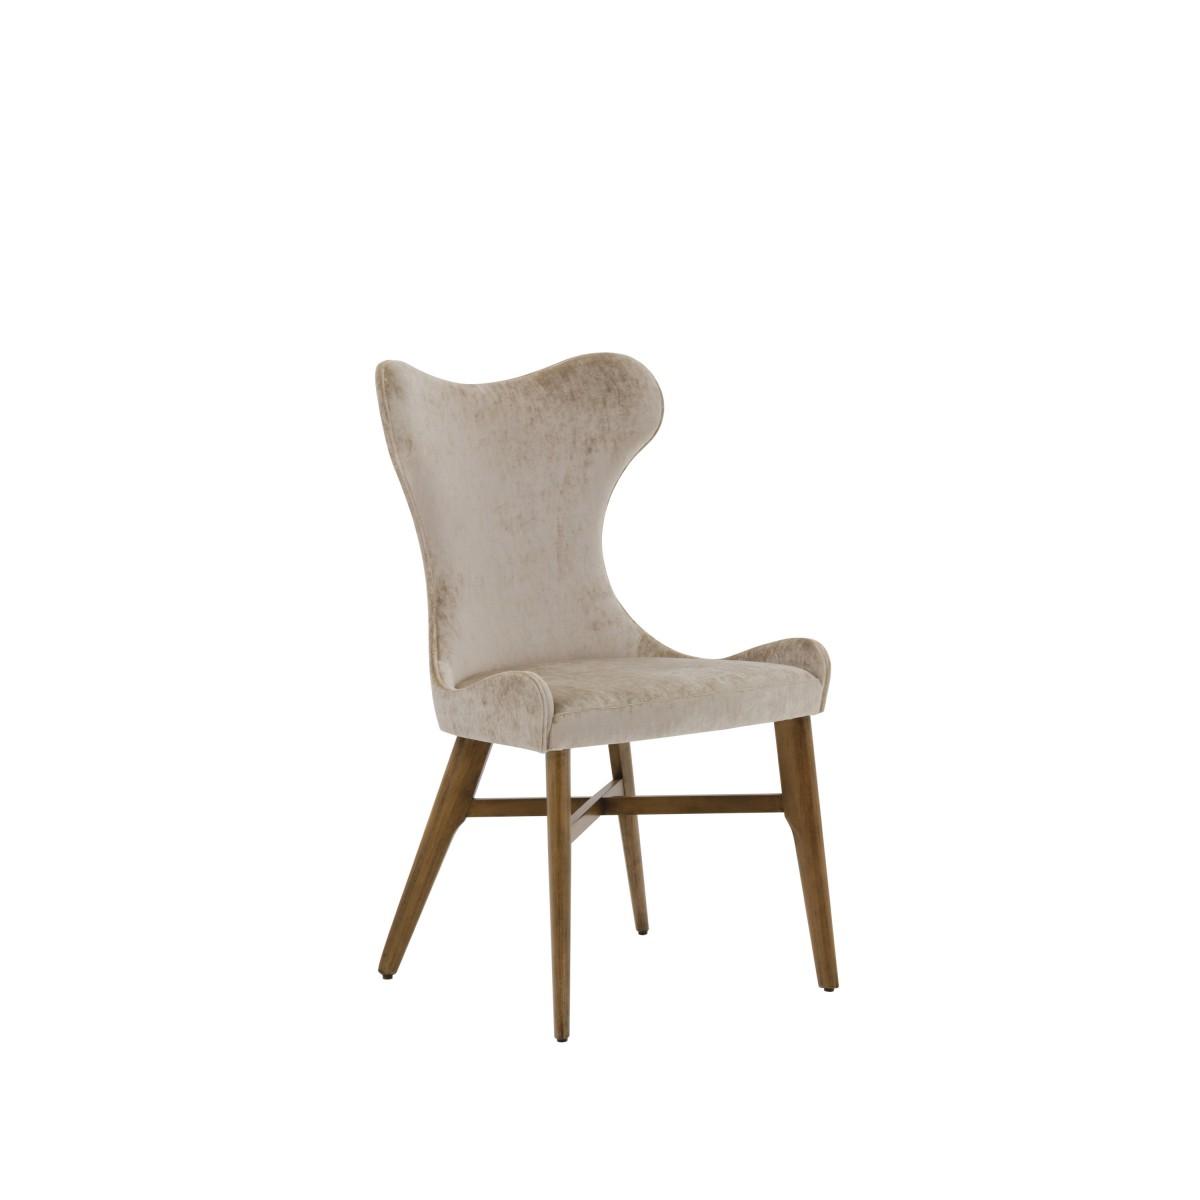 7101 modern style wood chair auribus4